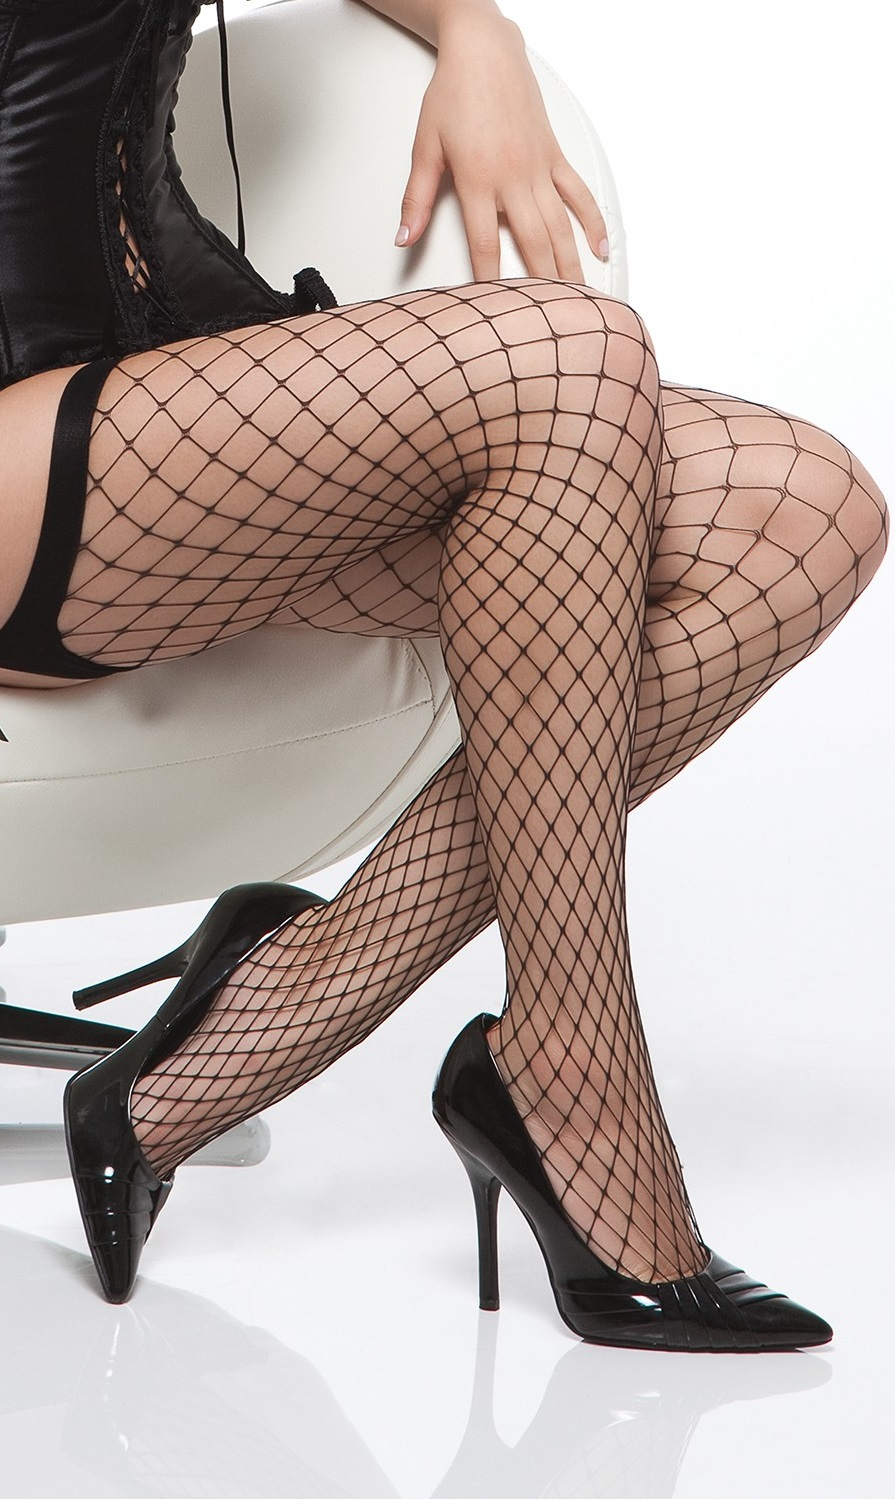 thigh Fetish stocking high movie